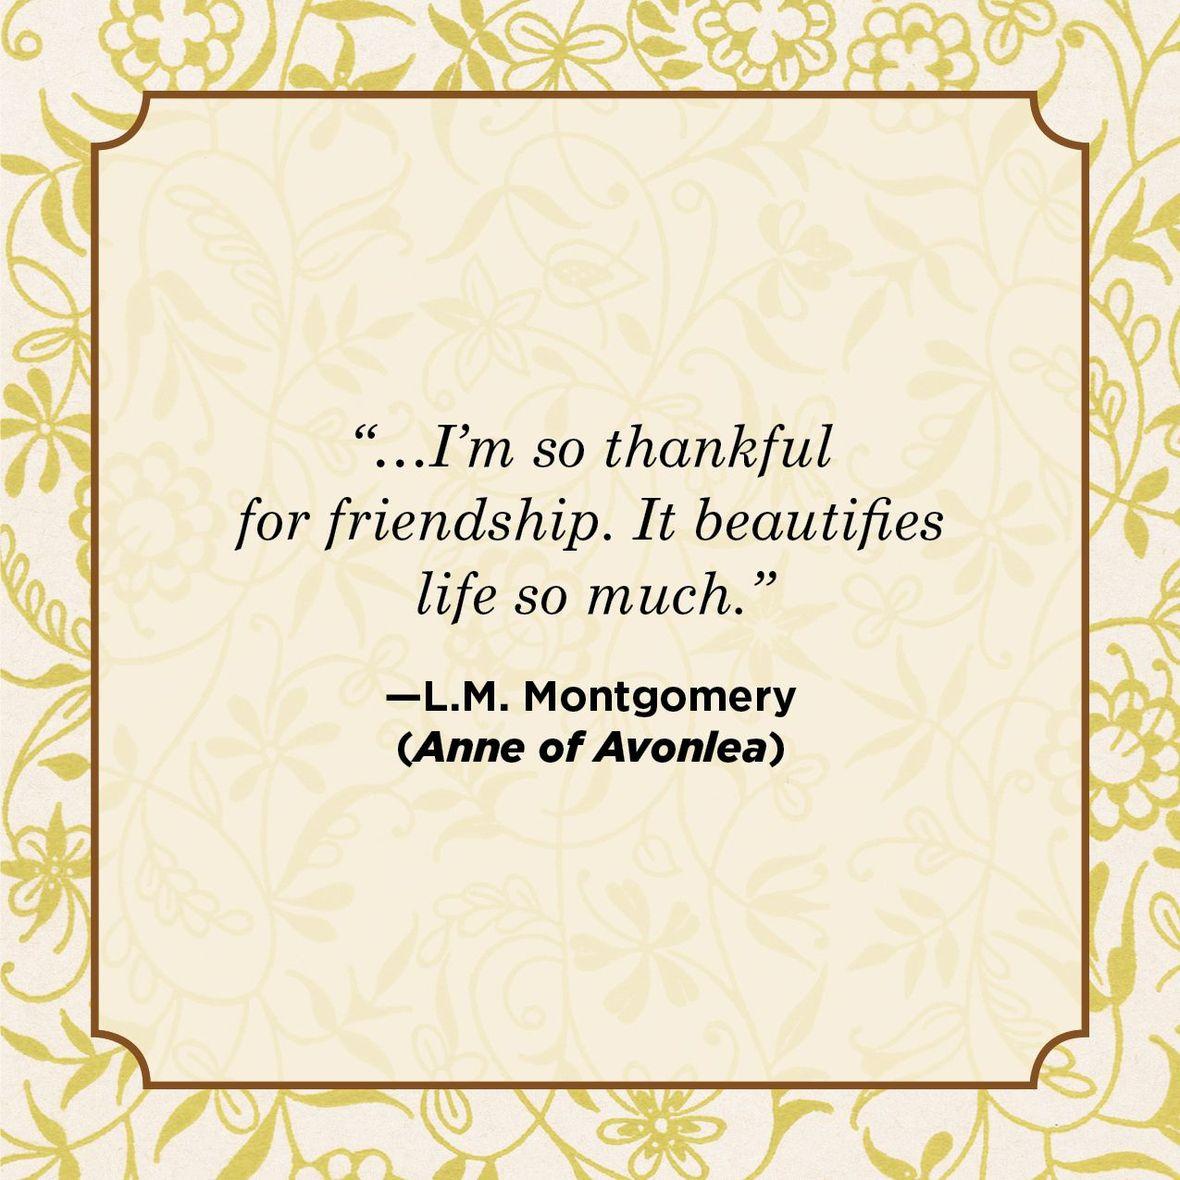 thankful-quotes12-1571683873